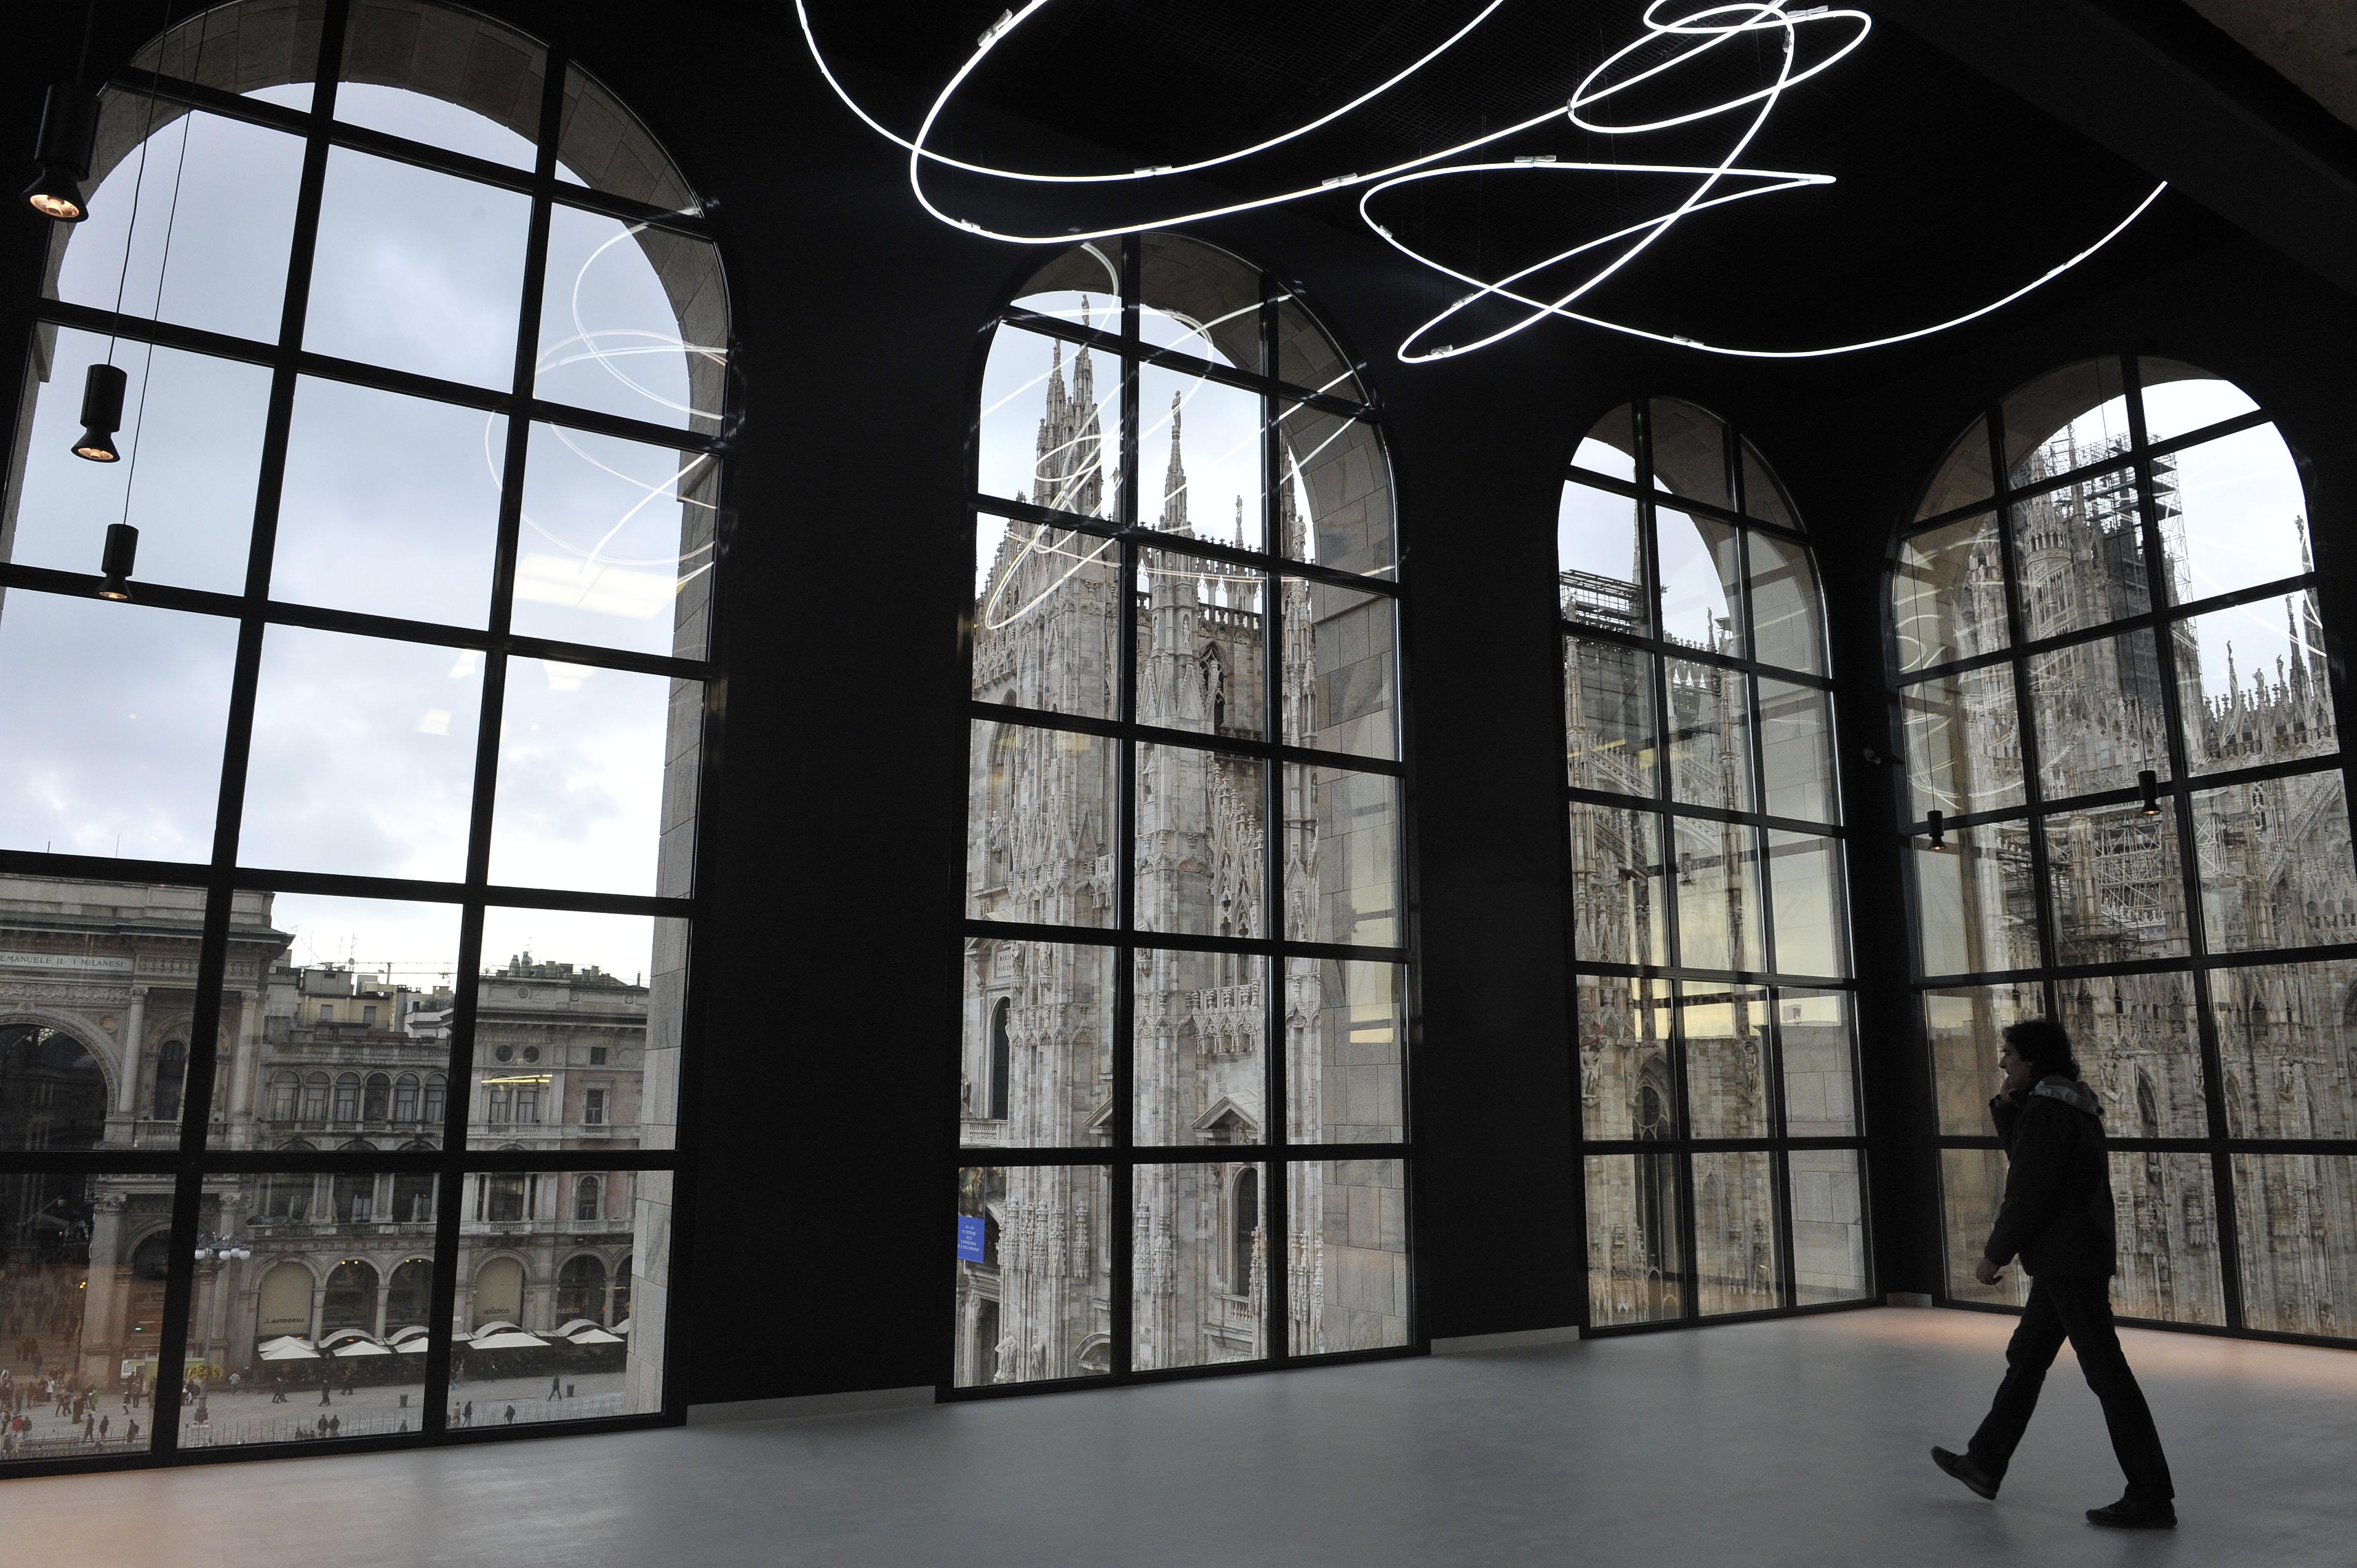 Milano design weekend diamoci del tu dialoghi fra arte e design milano 6 9 ottobre 2011 - Fiera design milano ...